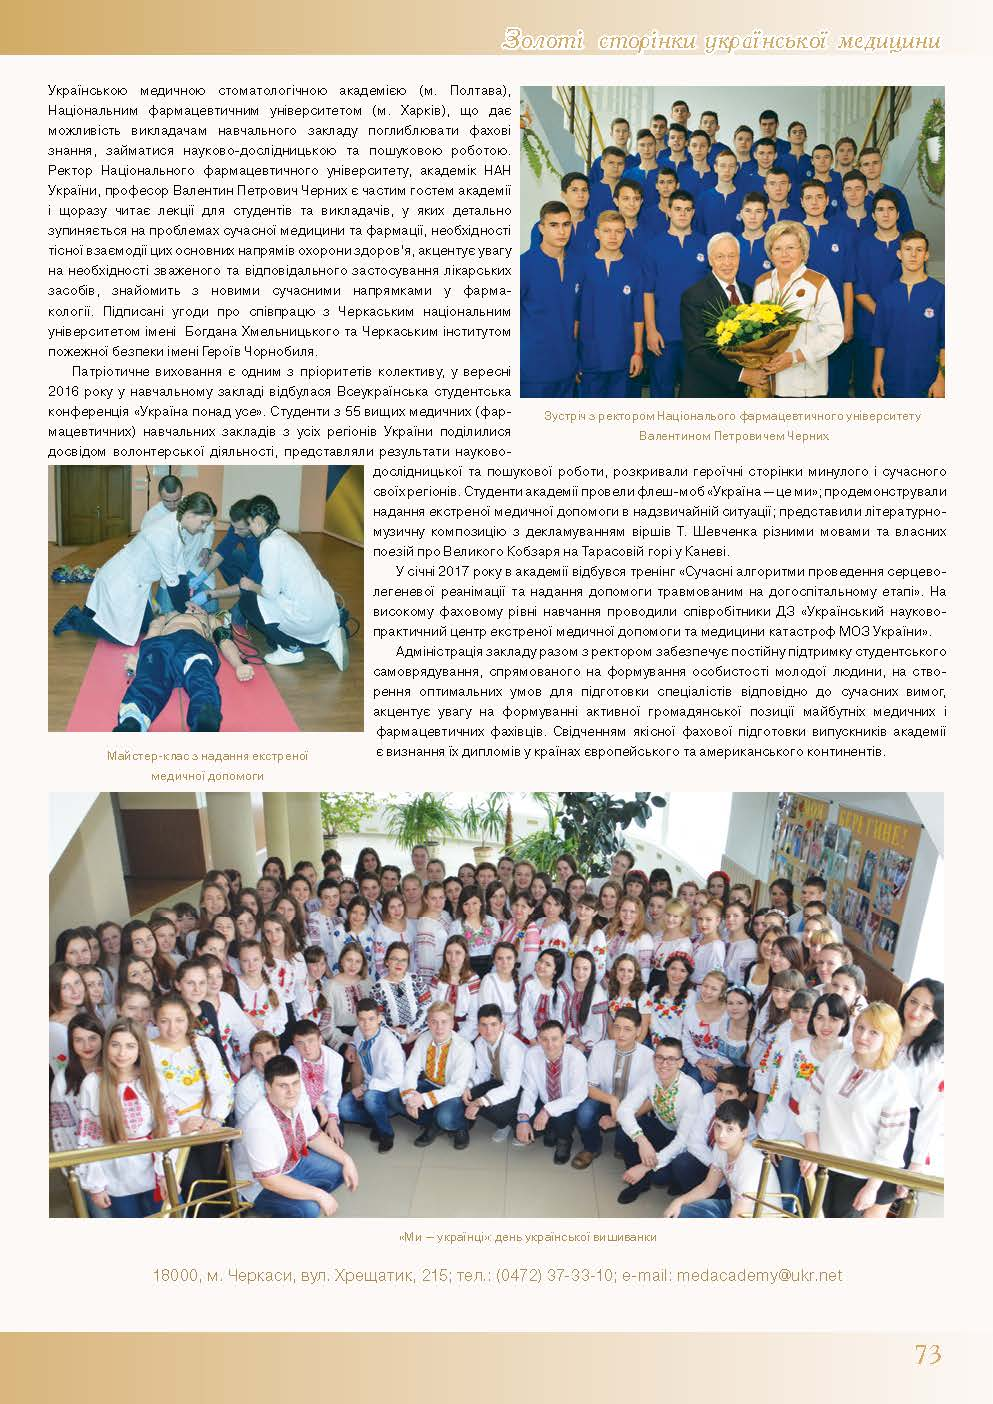 Черкаська медична академія